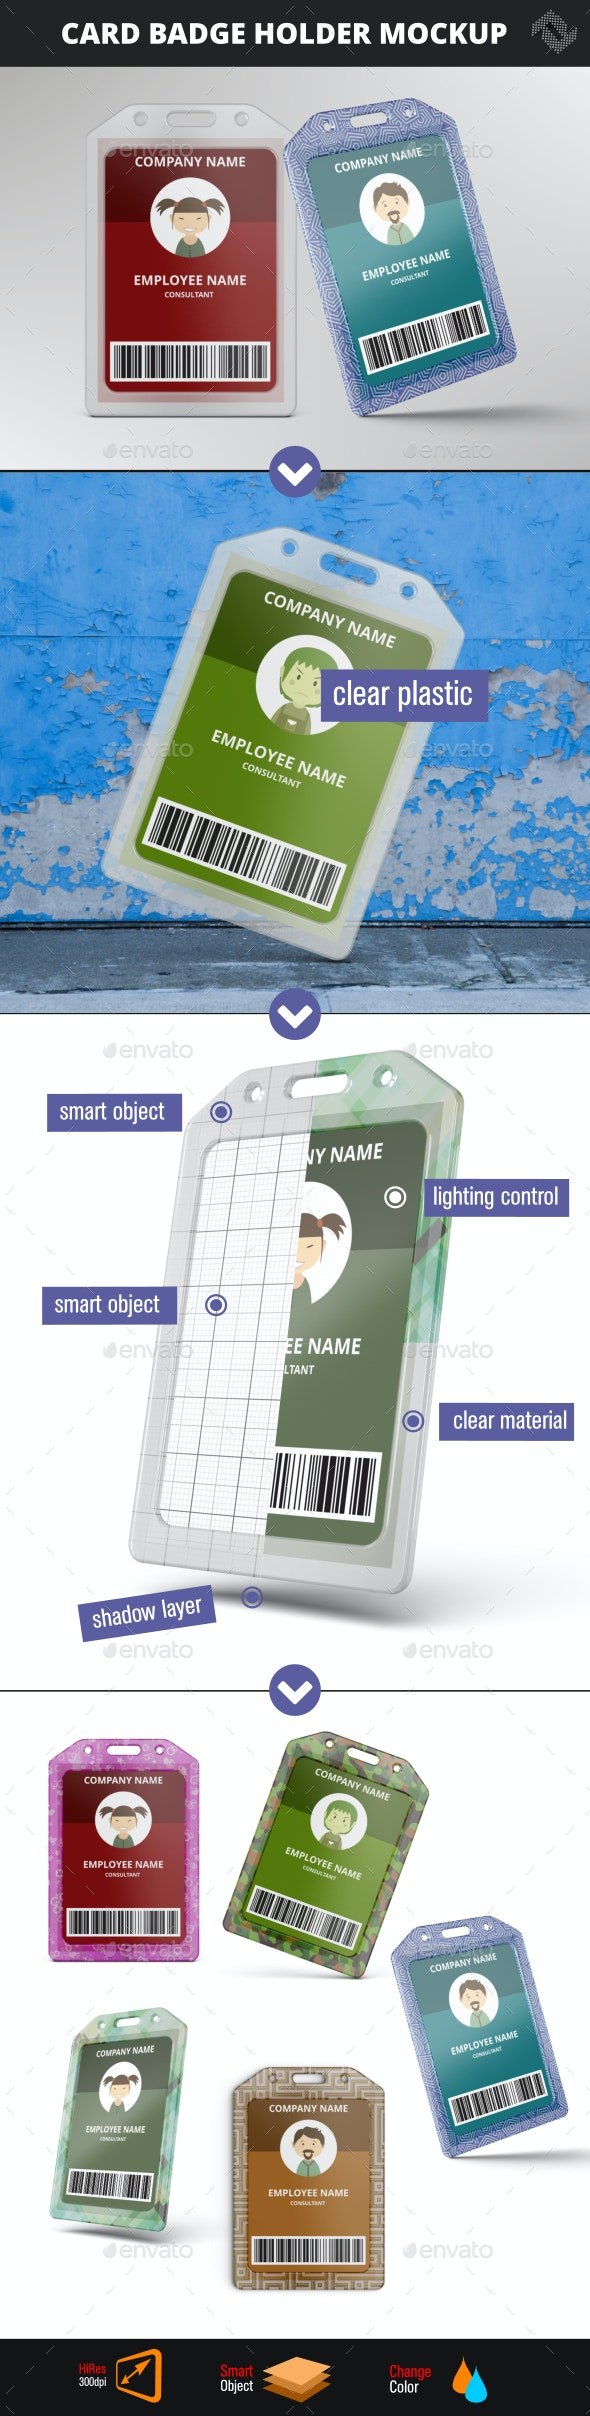 Card Badge Name Tag Holder Vertical Soft Clear PVC Mockup - Product Mock-Ups Graphics